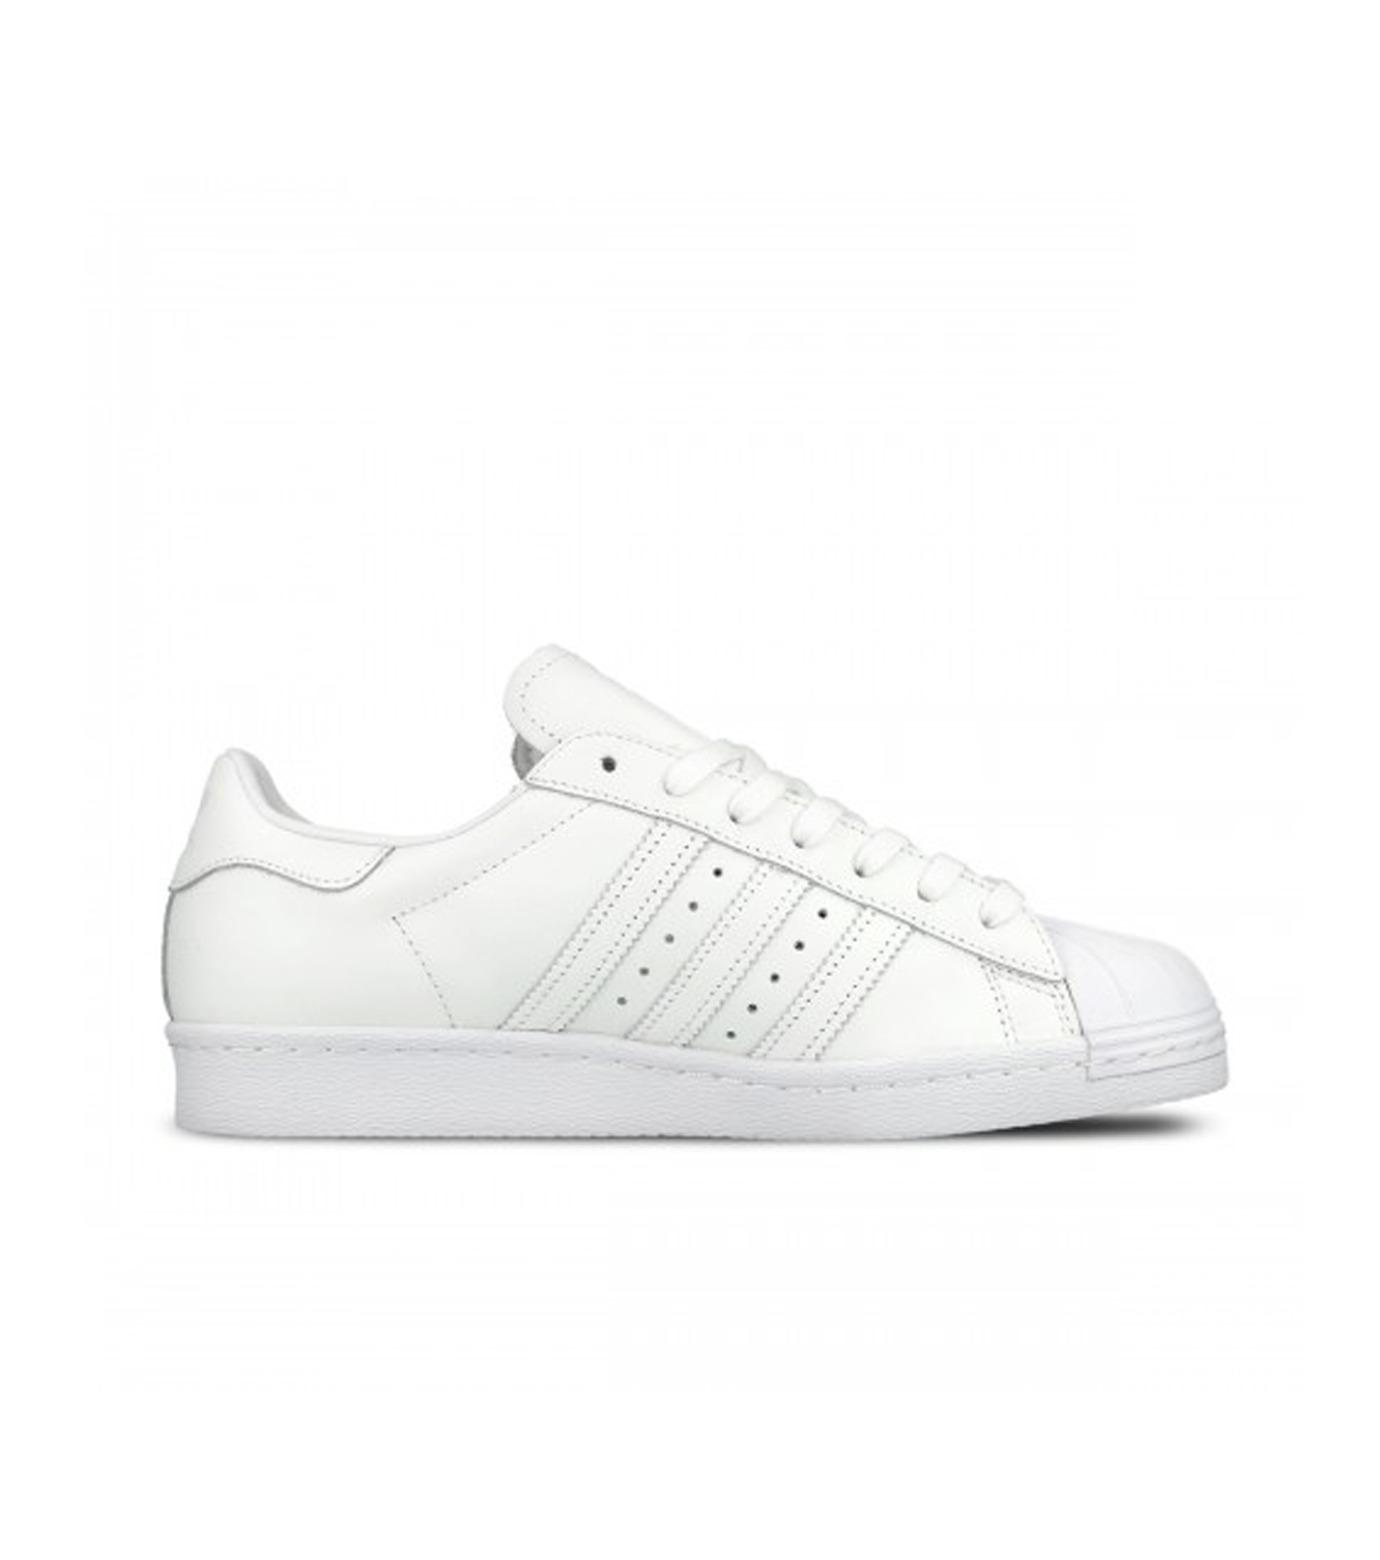 adidas(アディダス)のSUPERSTAR 80s-WHITE(シューズ/shoes)-S79443-4 拡大詳細画像1